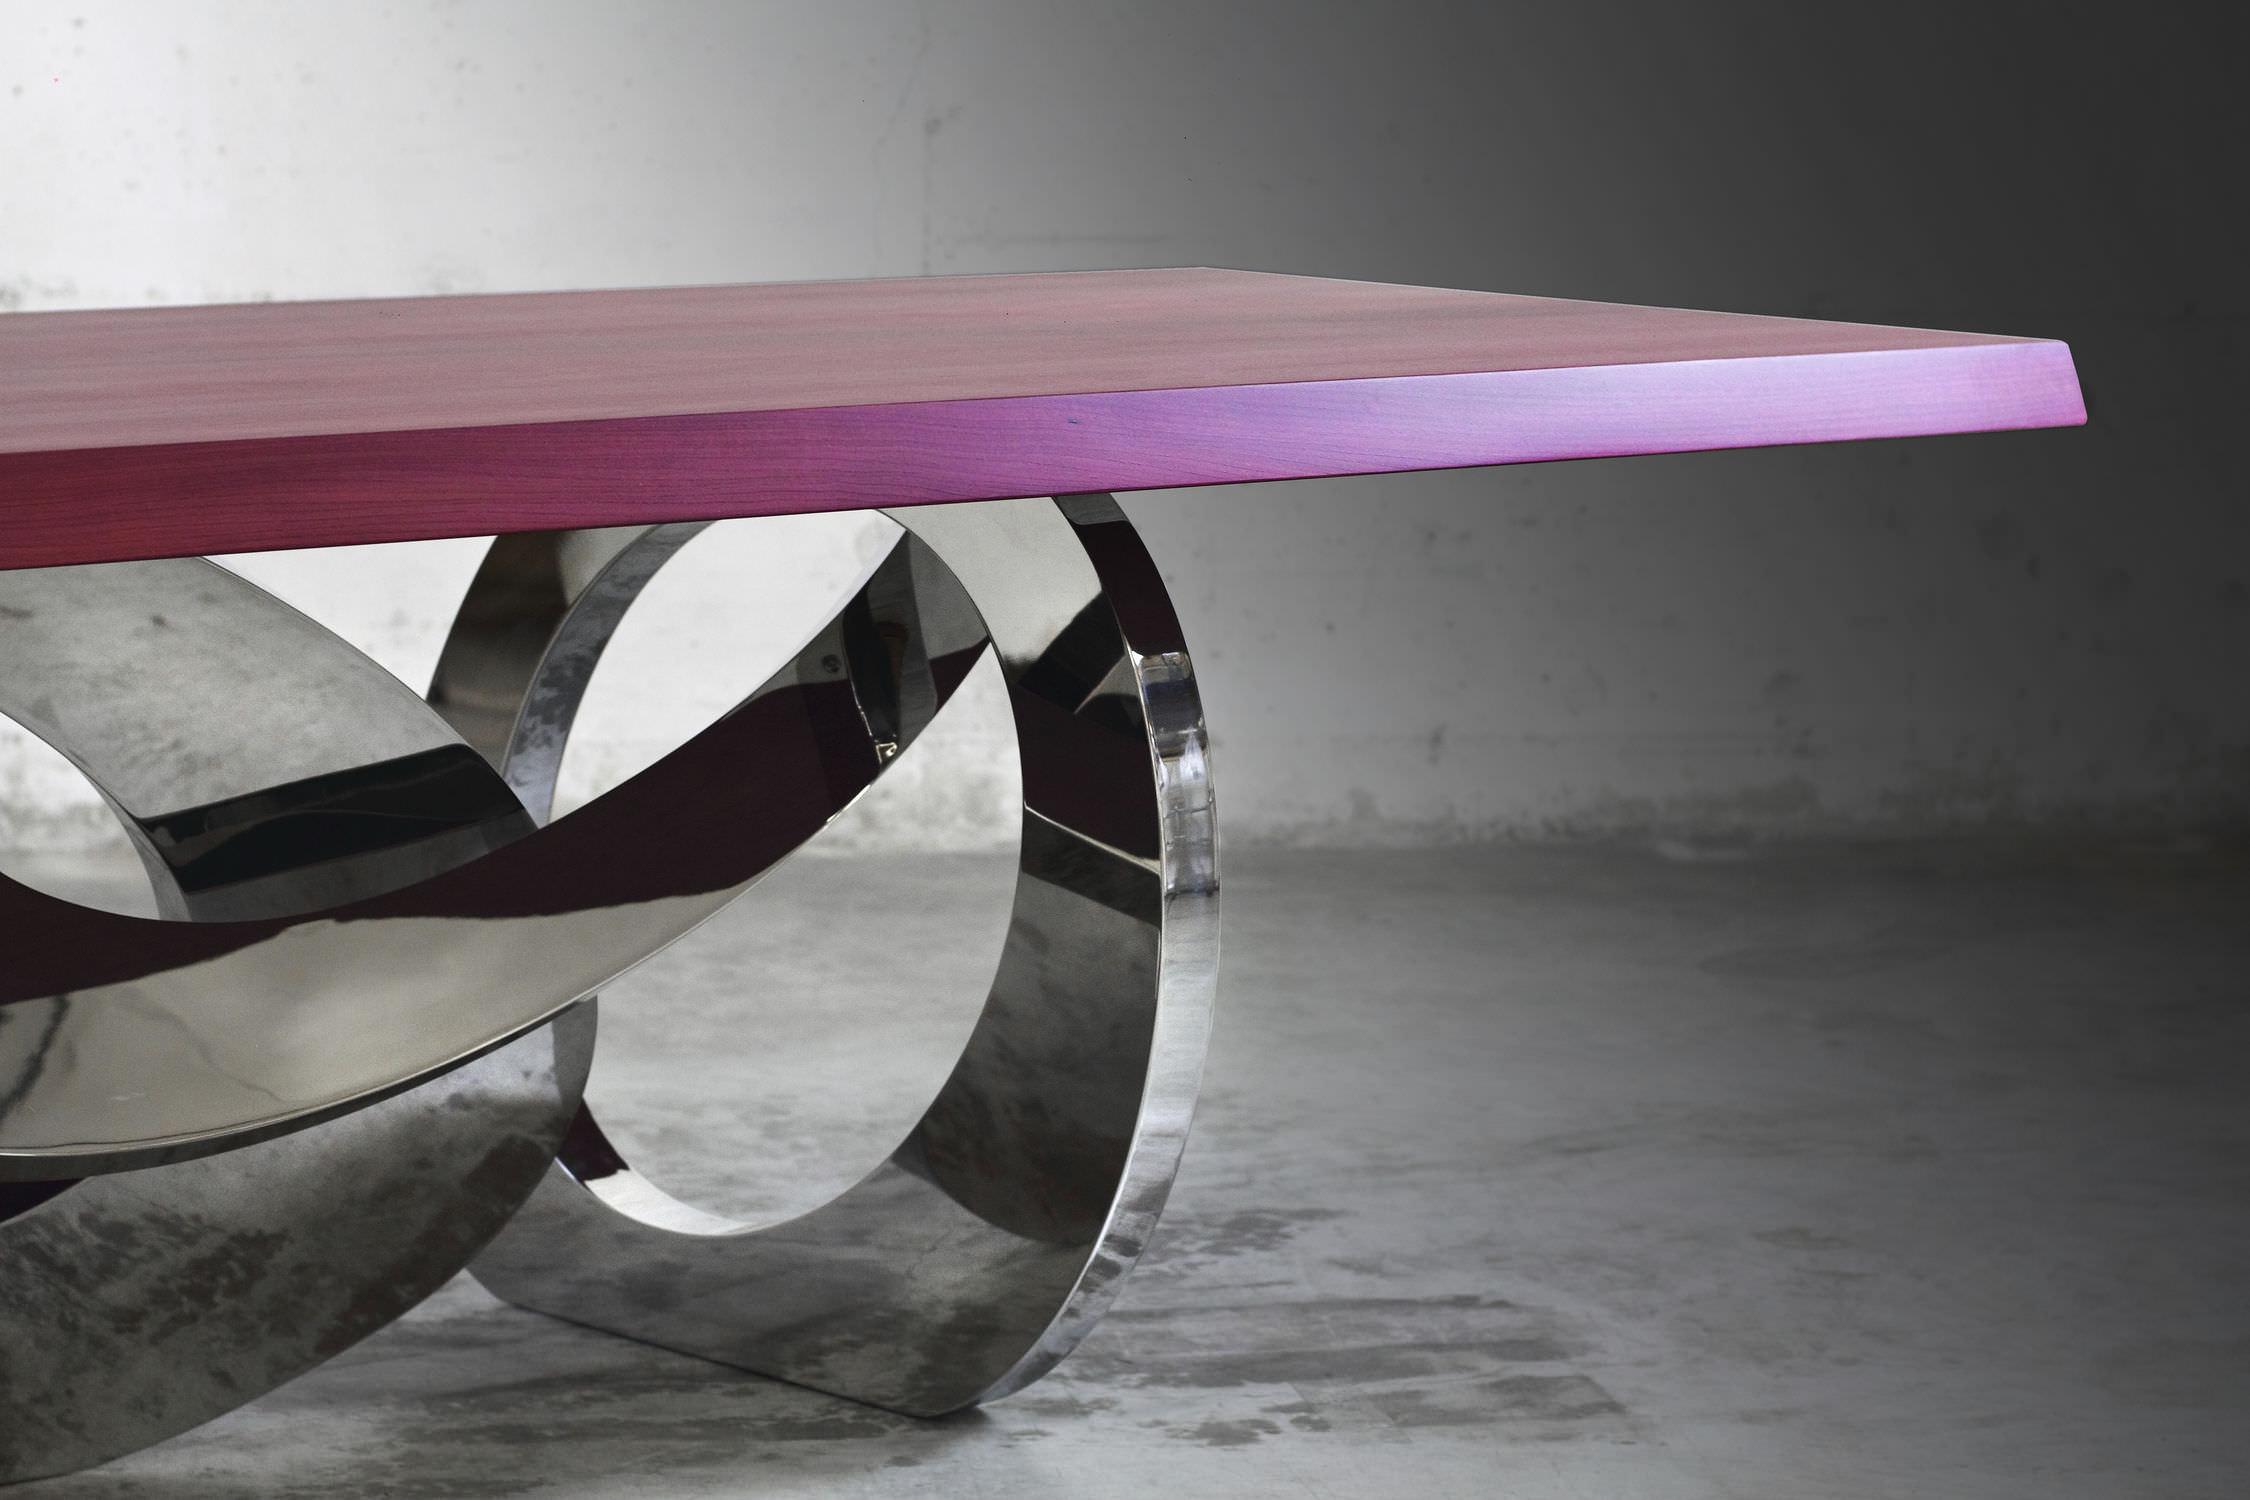 Contemporary dining table   solid wood   purpleheart   rectangular  BANGLES AMARANTO   LIMITED EDITION OF. Contemporary dining table   solid wood   purpleheart   rectangular